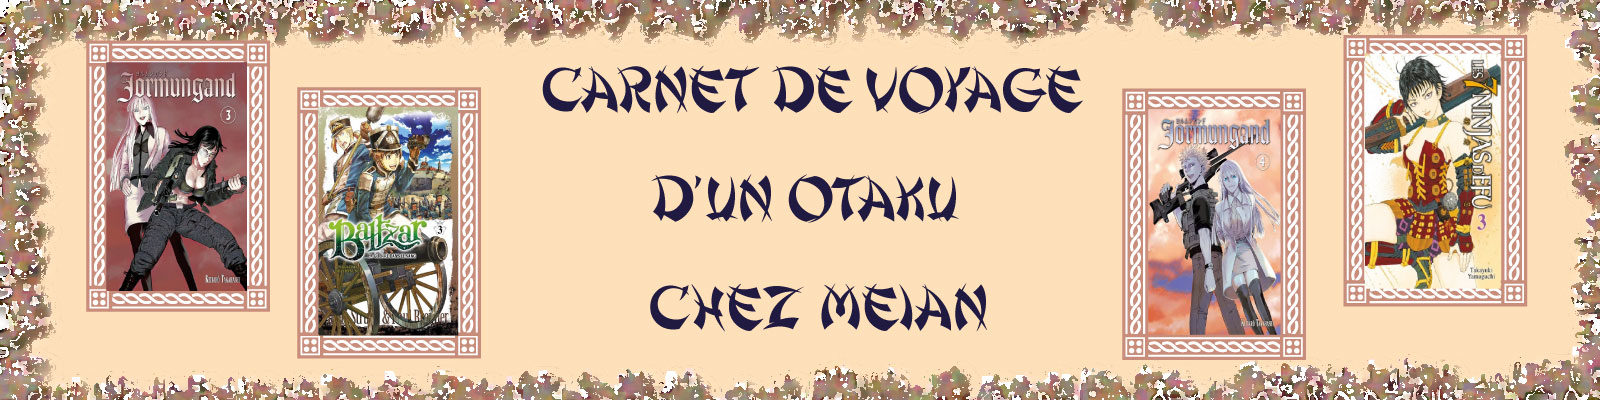 CARNET-DE-VOYAGE-OTAKU-meian